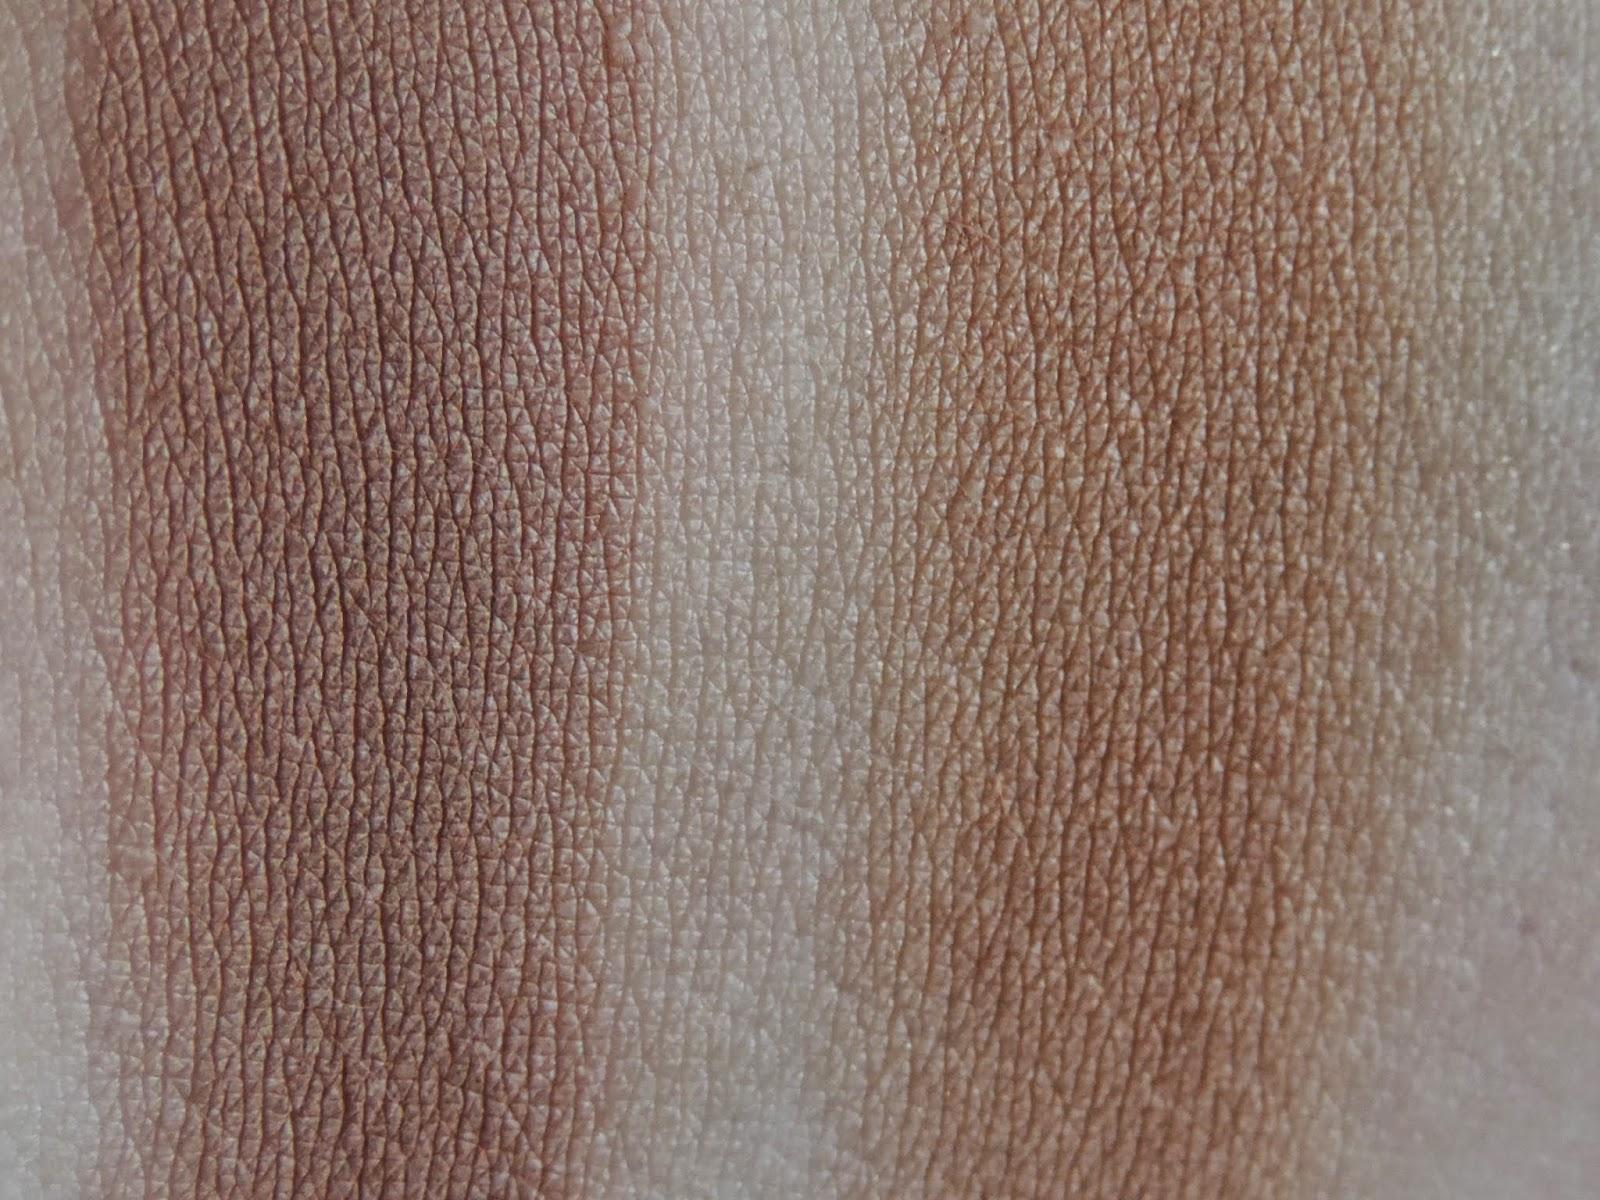 Swatches: Bobbi Brown Bronzing Powder in Natural, Dior Skin Nude Bronzer in Amber